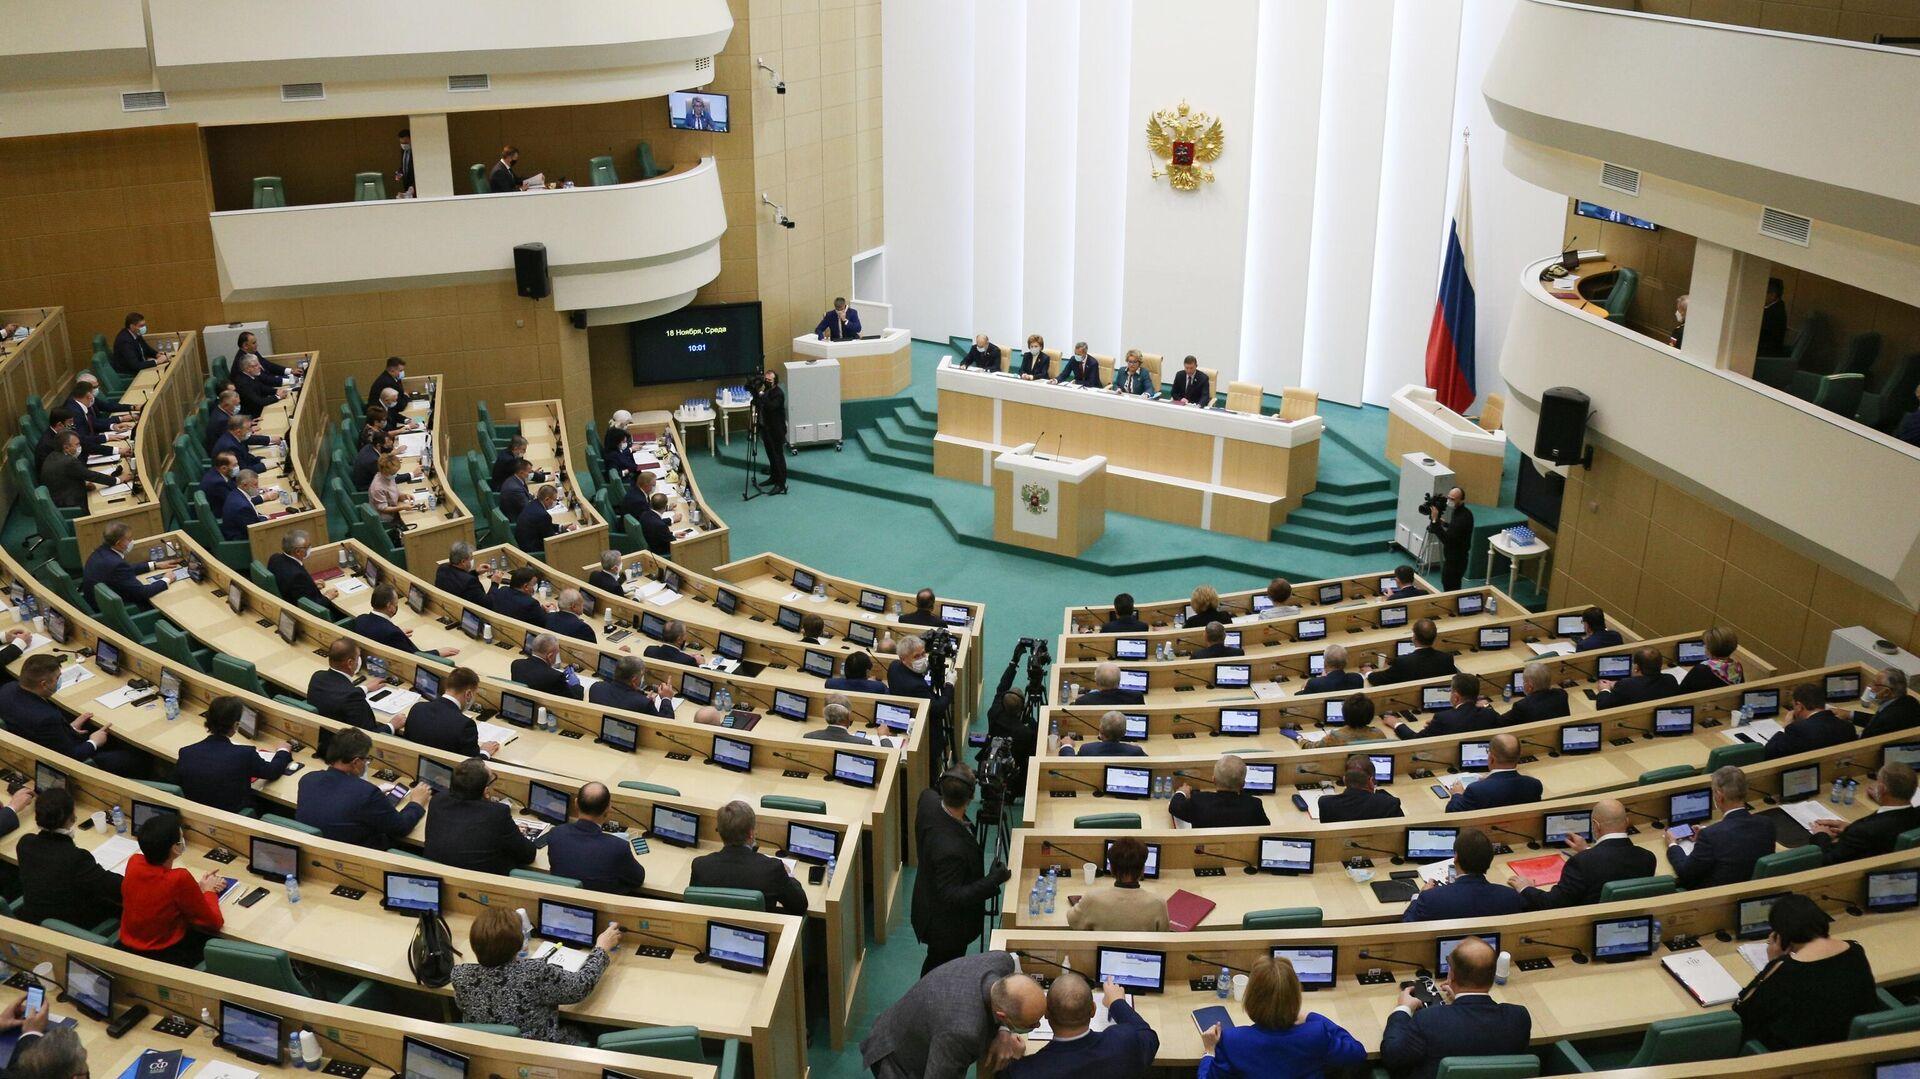 Заседание Совета Федерации РФ - РИА Новости, 1920, 18.01.2021